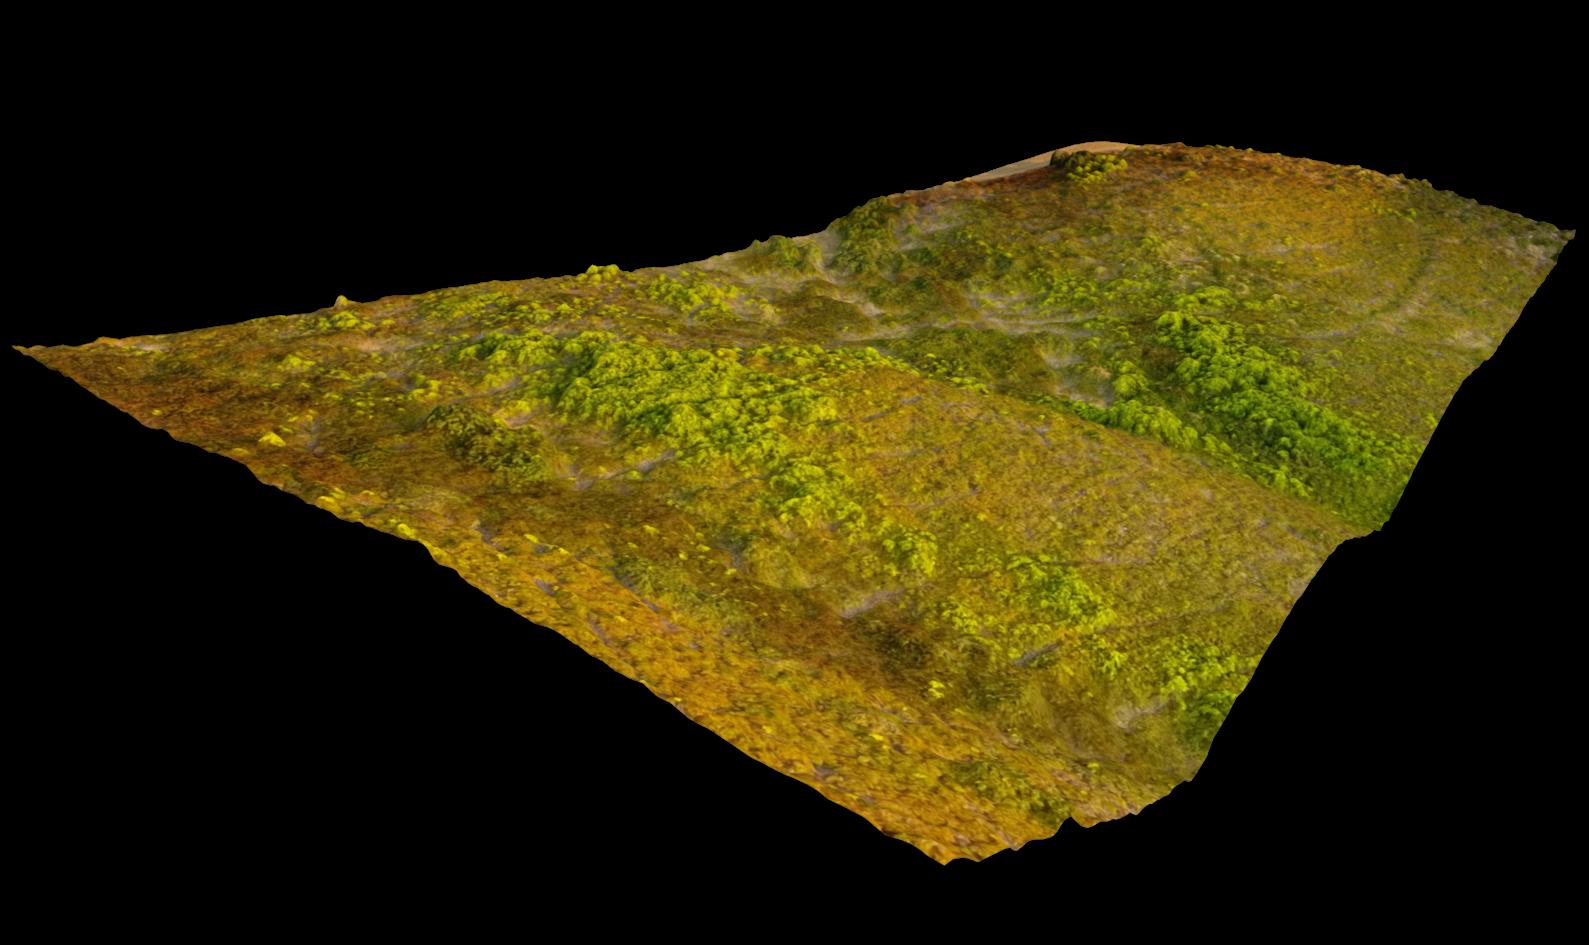 3D_Model_Mesh_Surface_Aerial_Shot.png